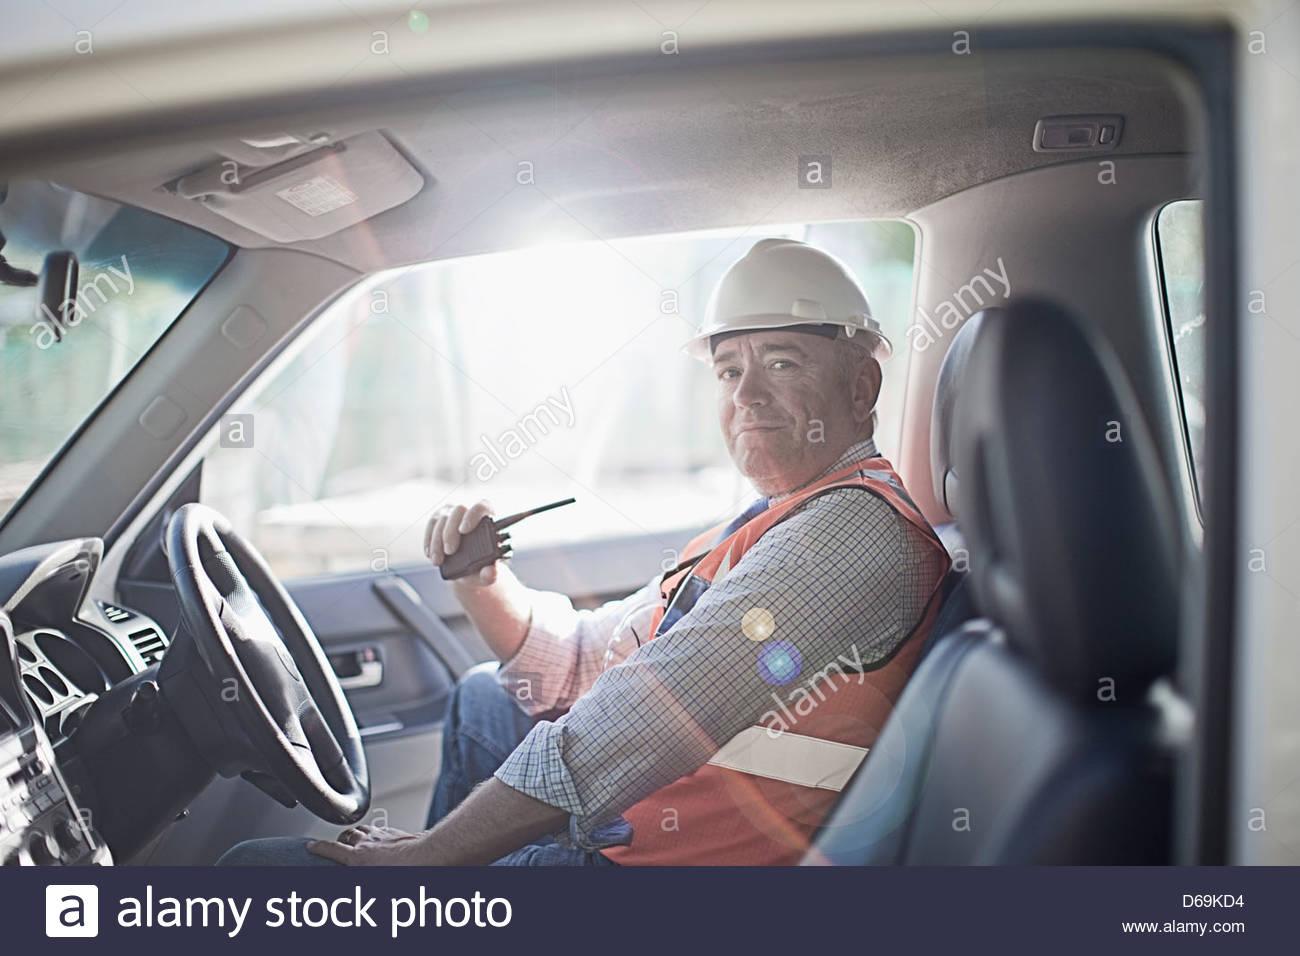 Businessman using walkie talkie in car - Stock Image